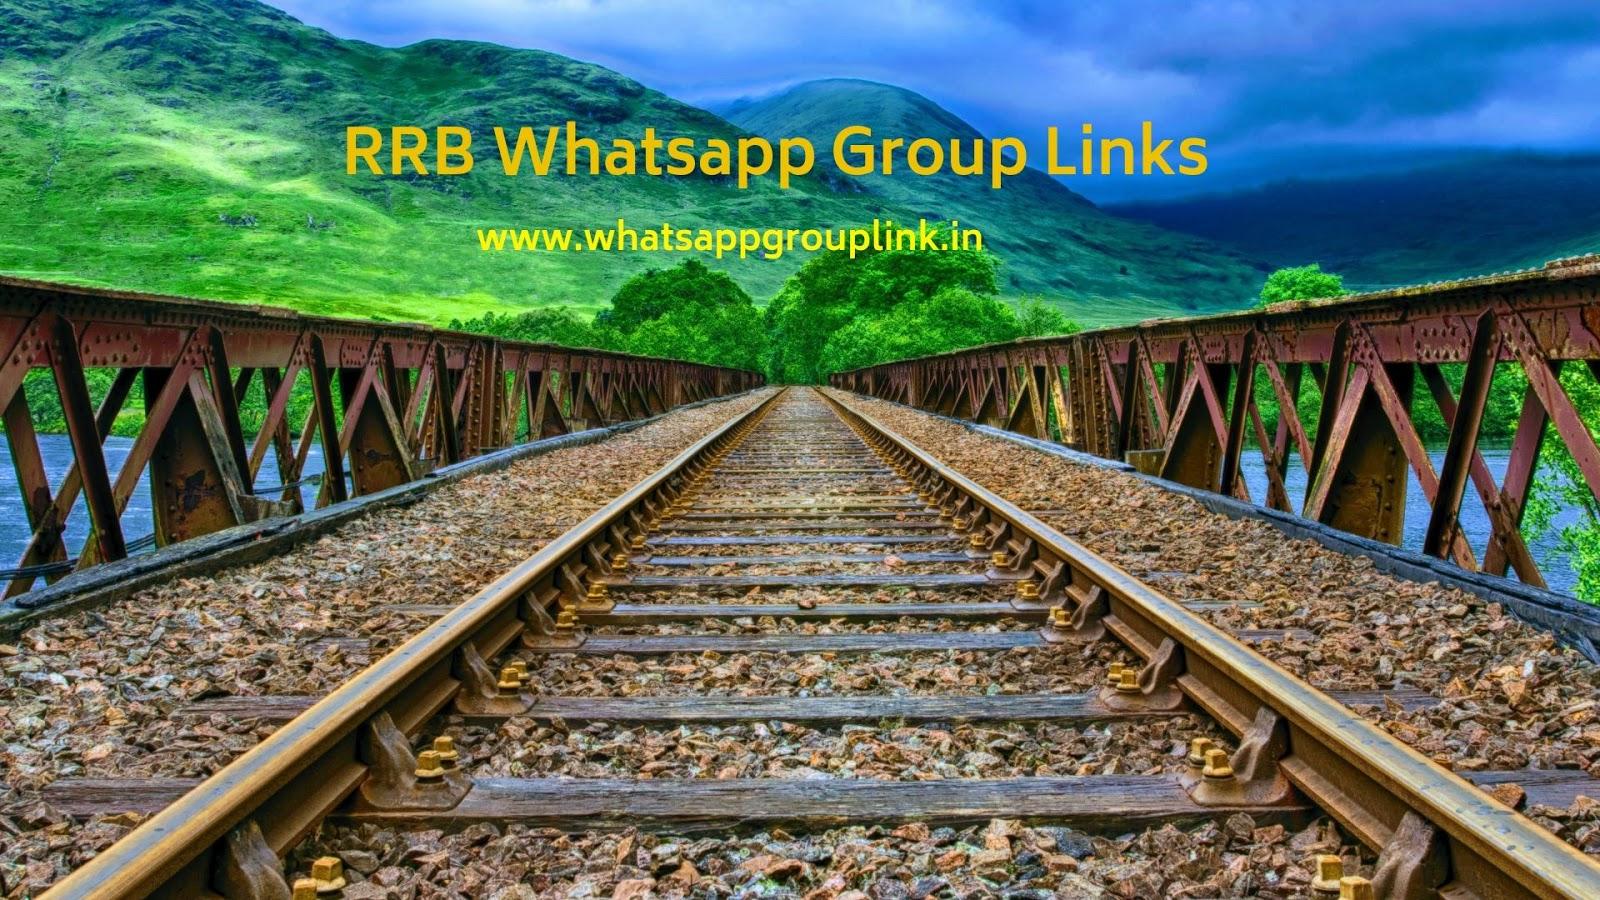 Kas Whatsapp Group Link